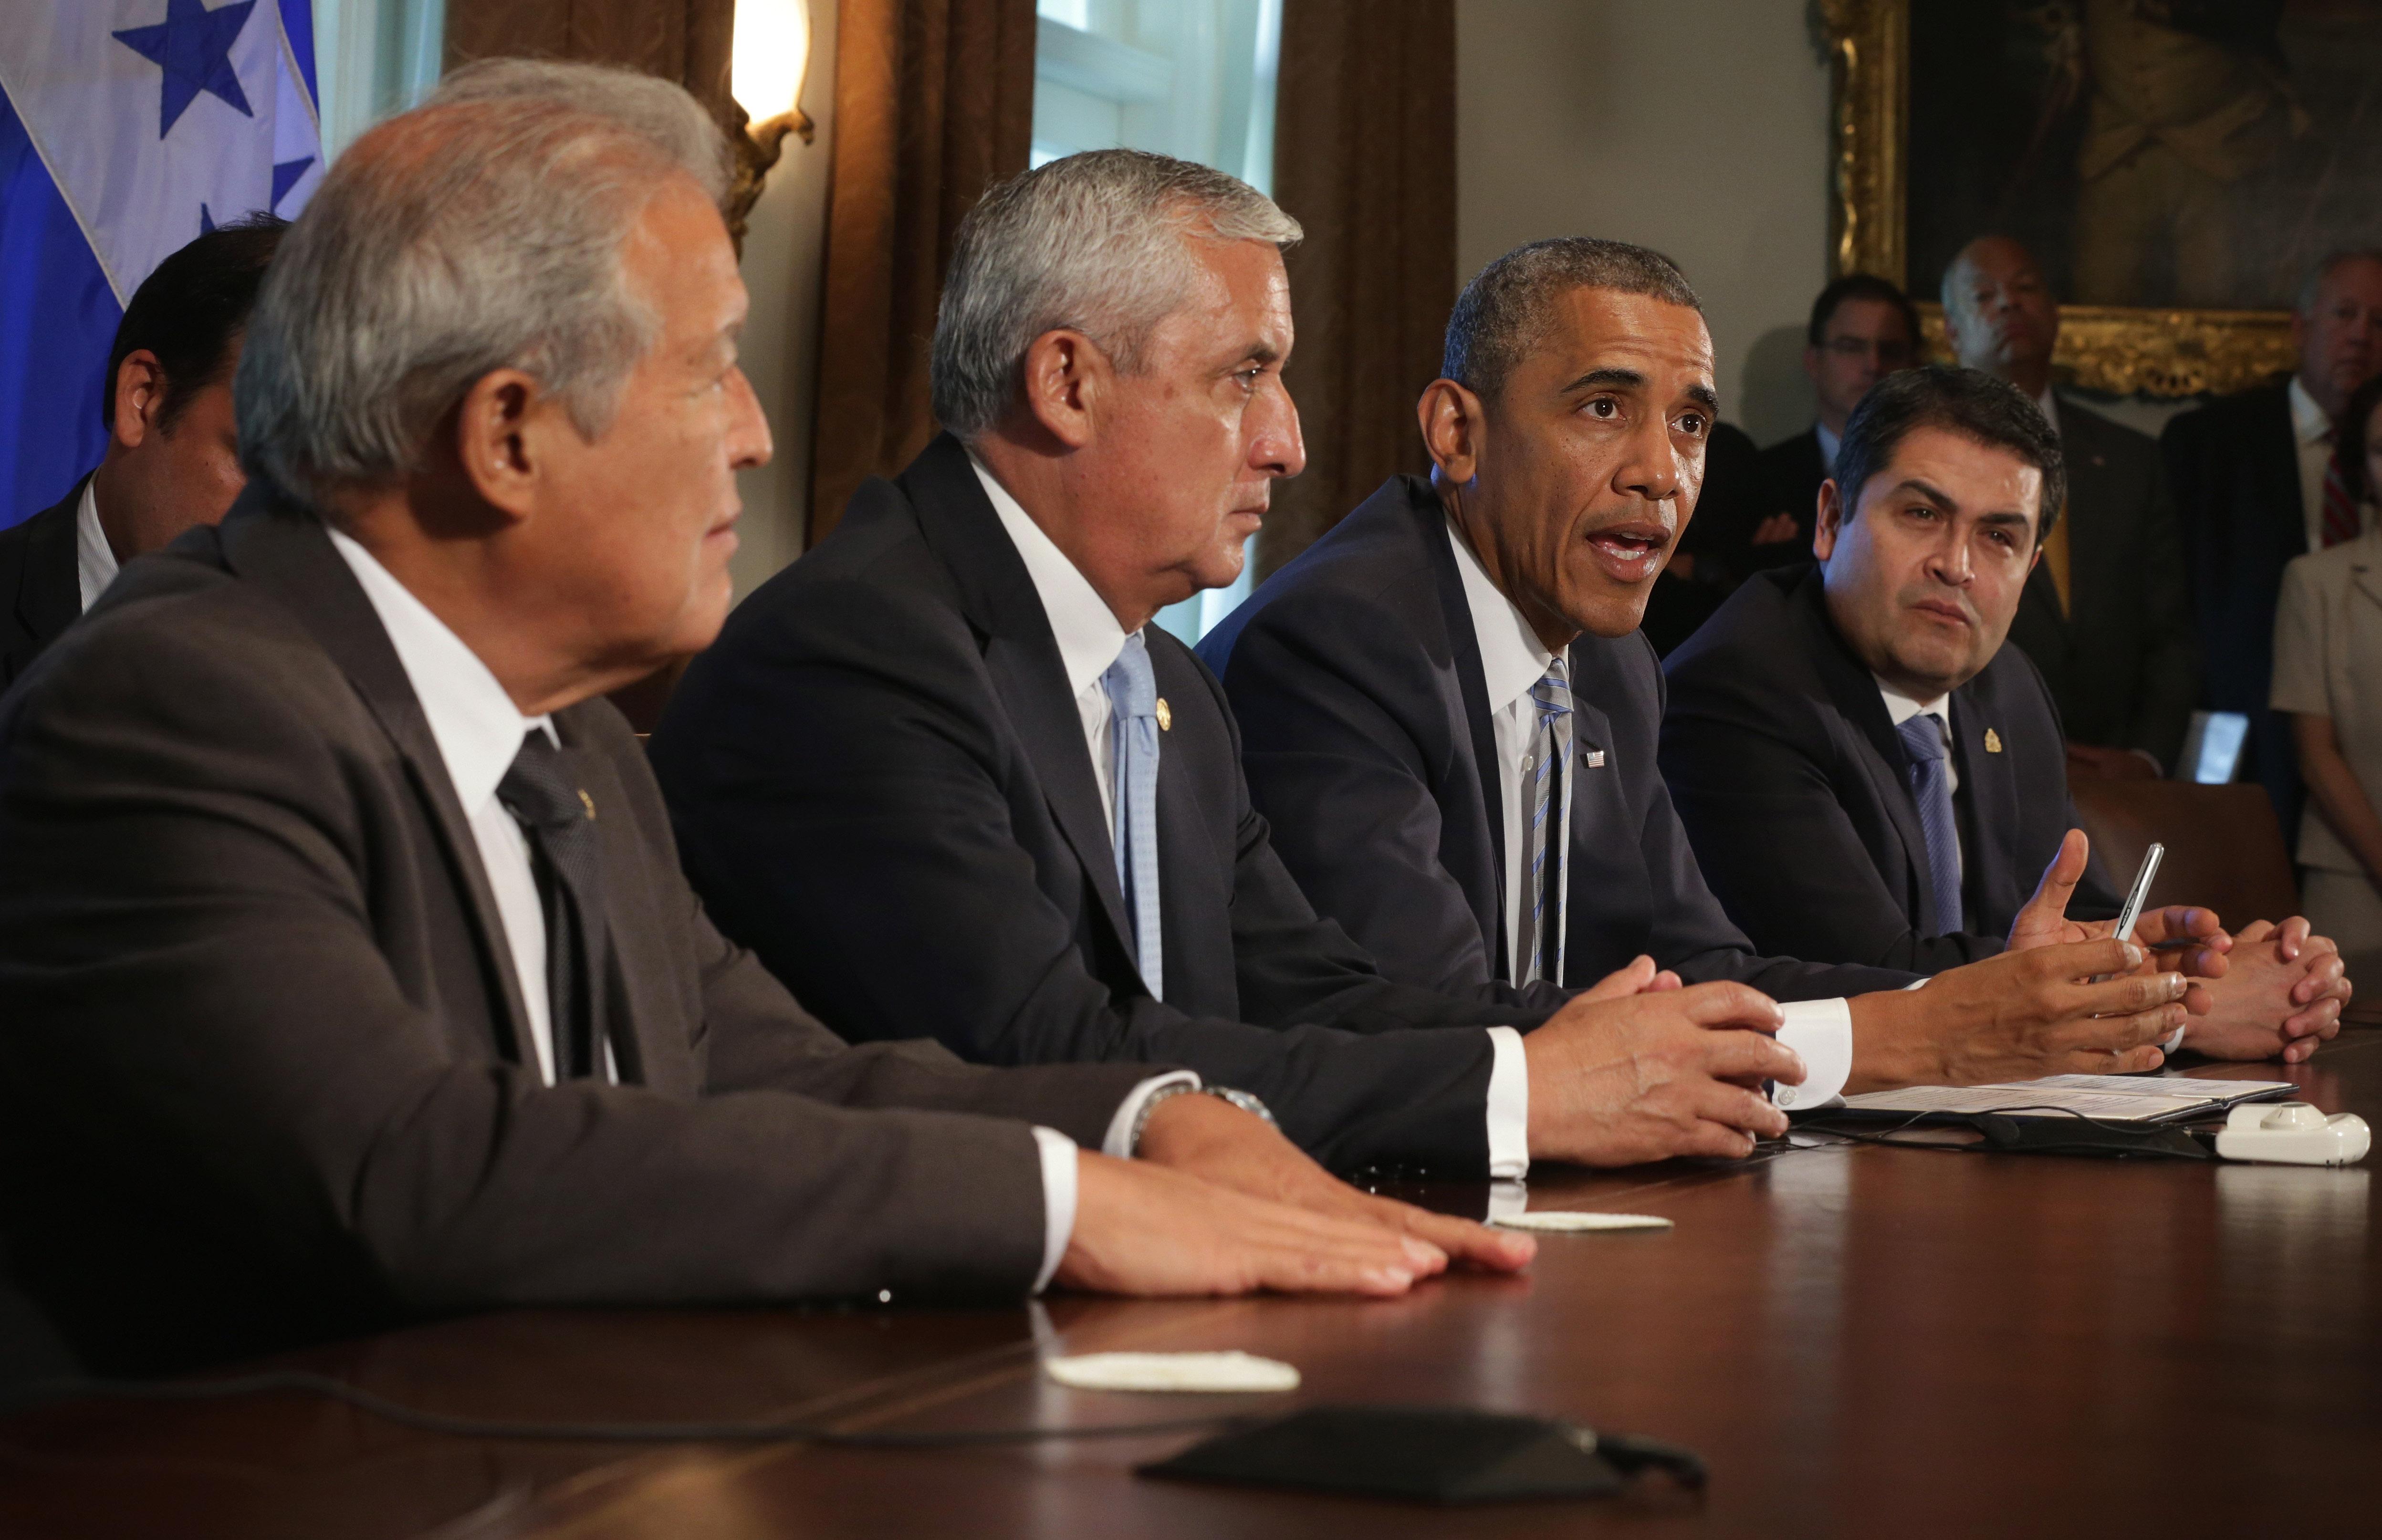 U.S. President Barack Obama speaks as President Otto Perez Molina (2nd L) of Guatemala, President Juan Orlando Hernandez (R) of Honduras, and President Salvador Sanchez Ceren (L) of El Salvador listen in the White House July 25, 2014 in Washington, DC.